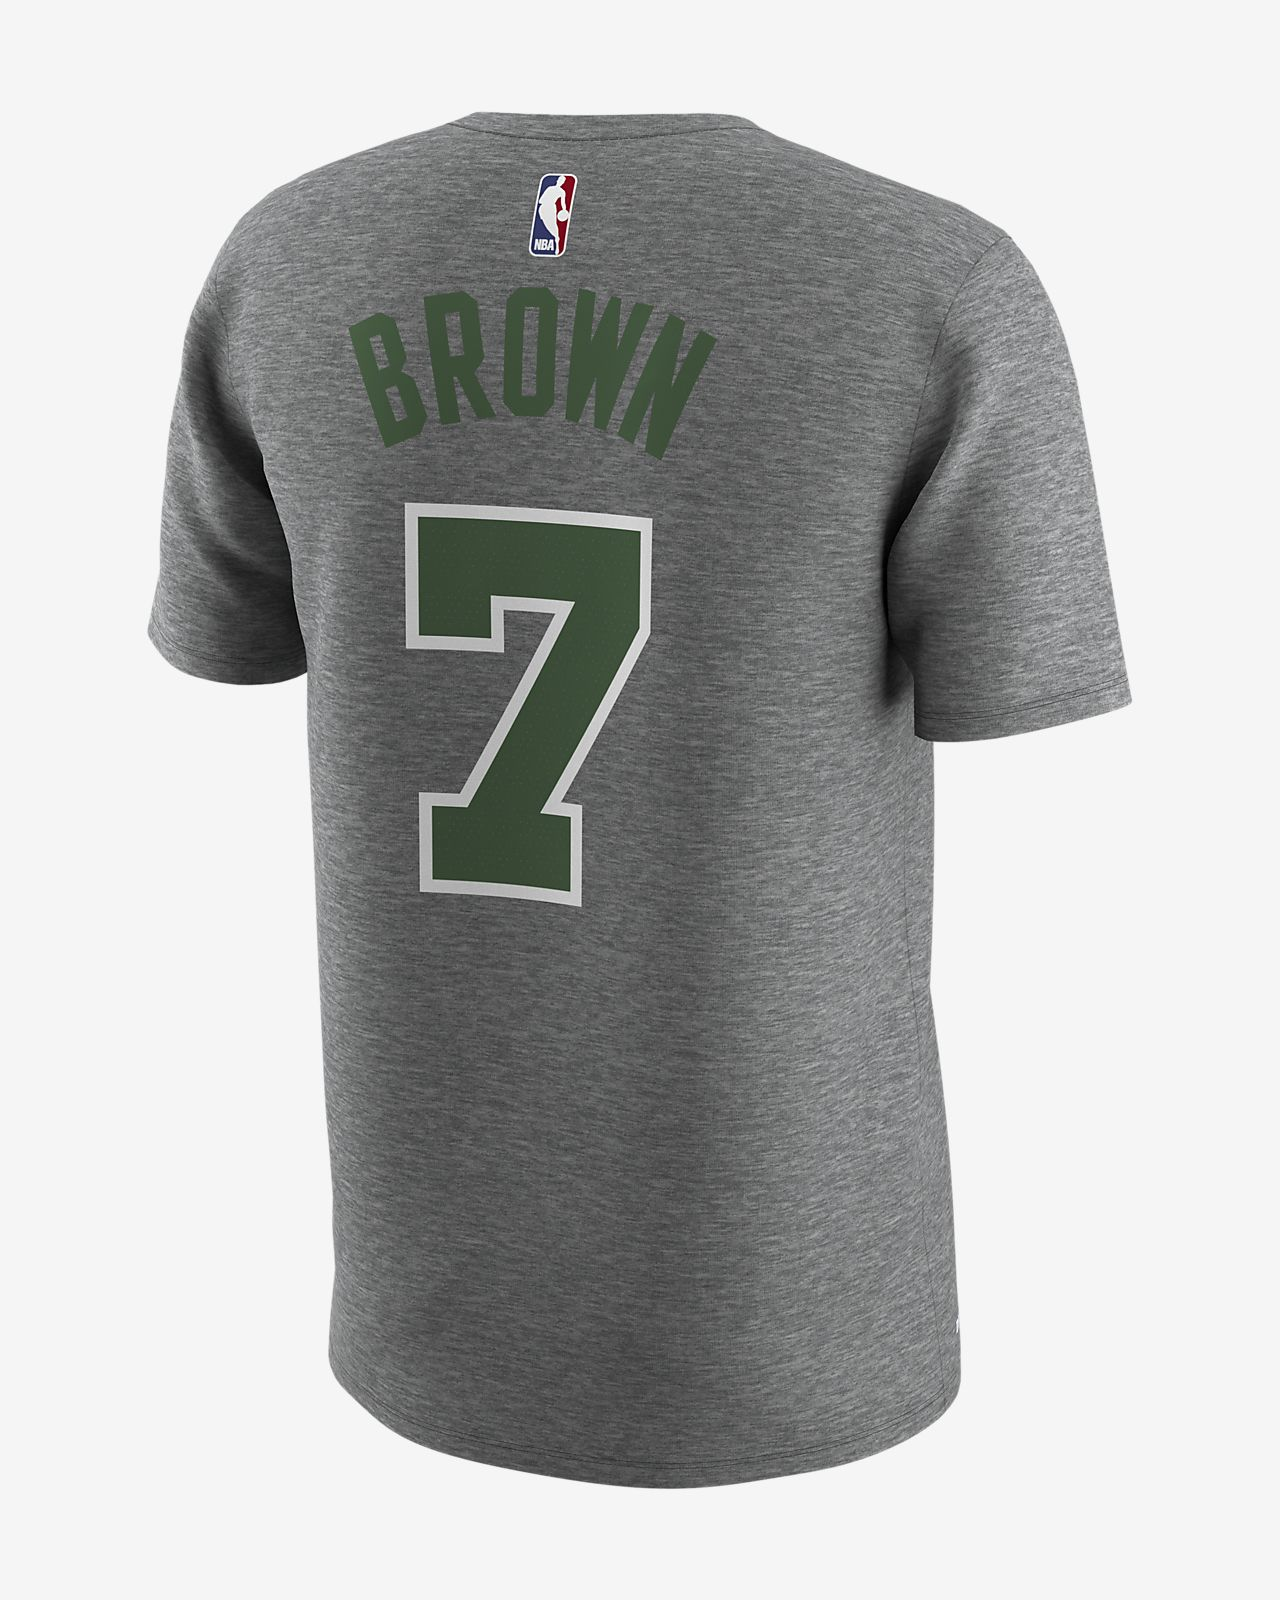 huge discount 39458 15323 Boston Celtics City Edition (Jaylen Brown) Nike Dri-FIT Men's NBA T-Shirt